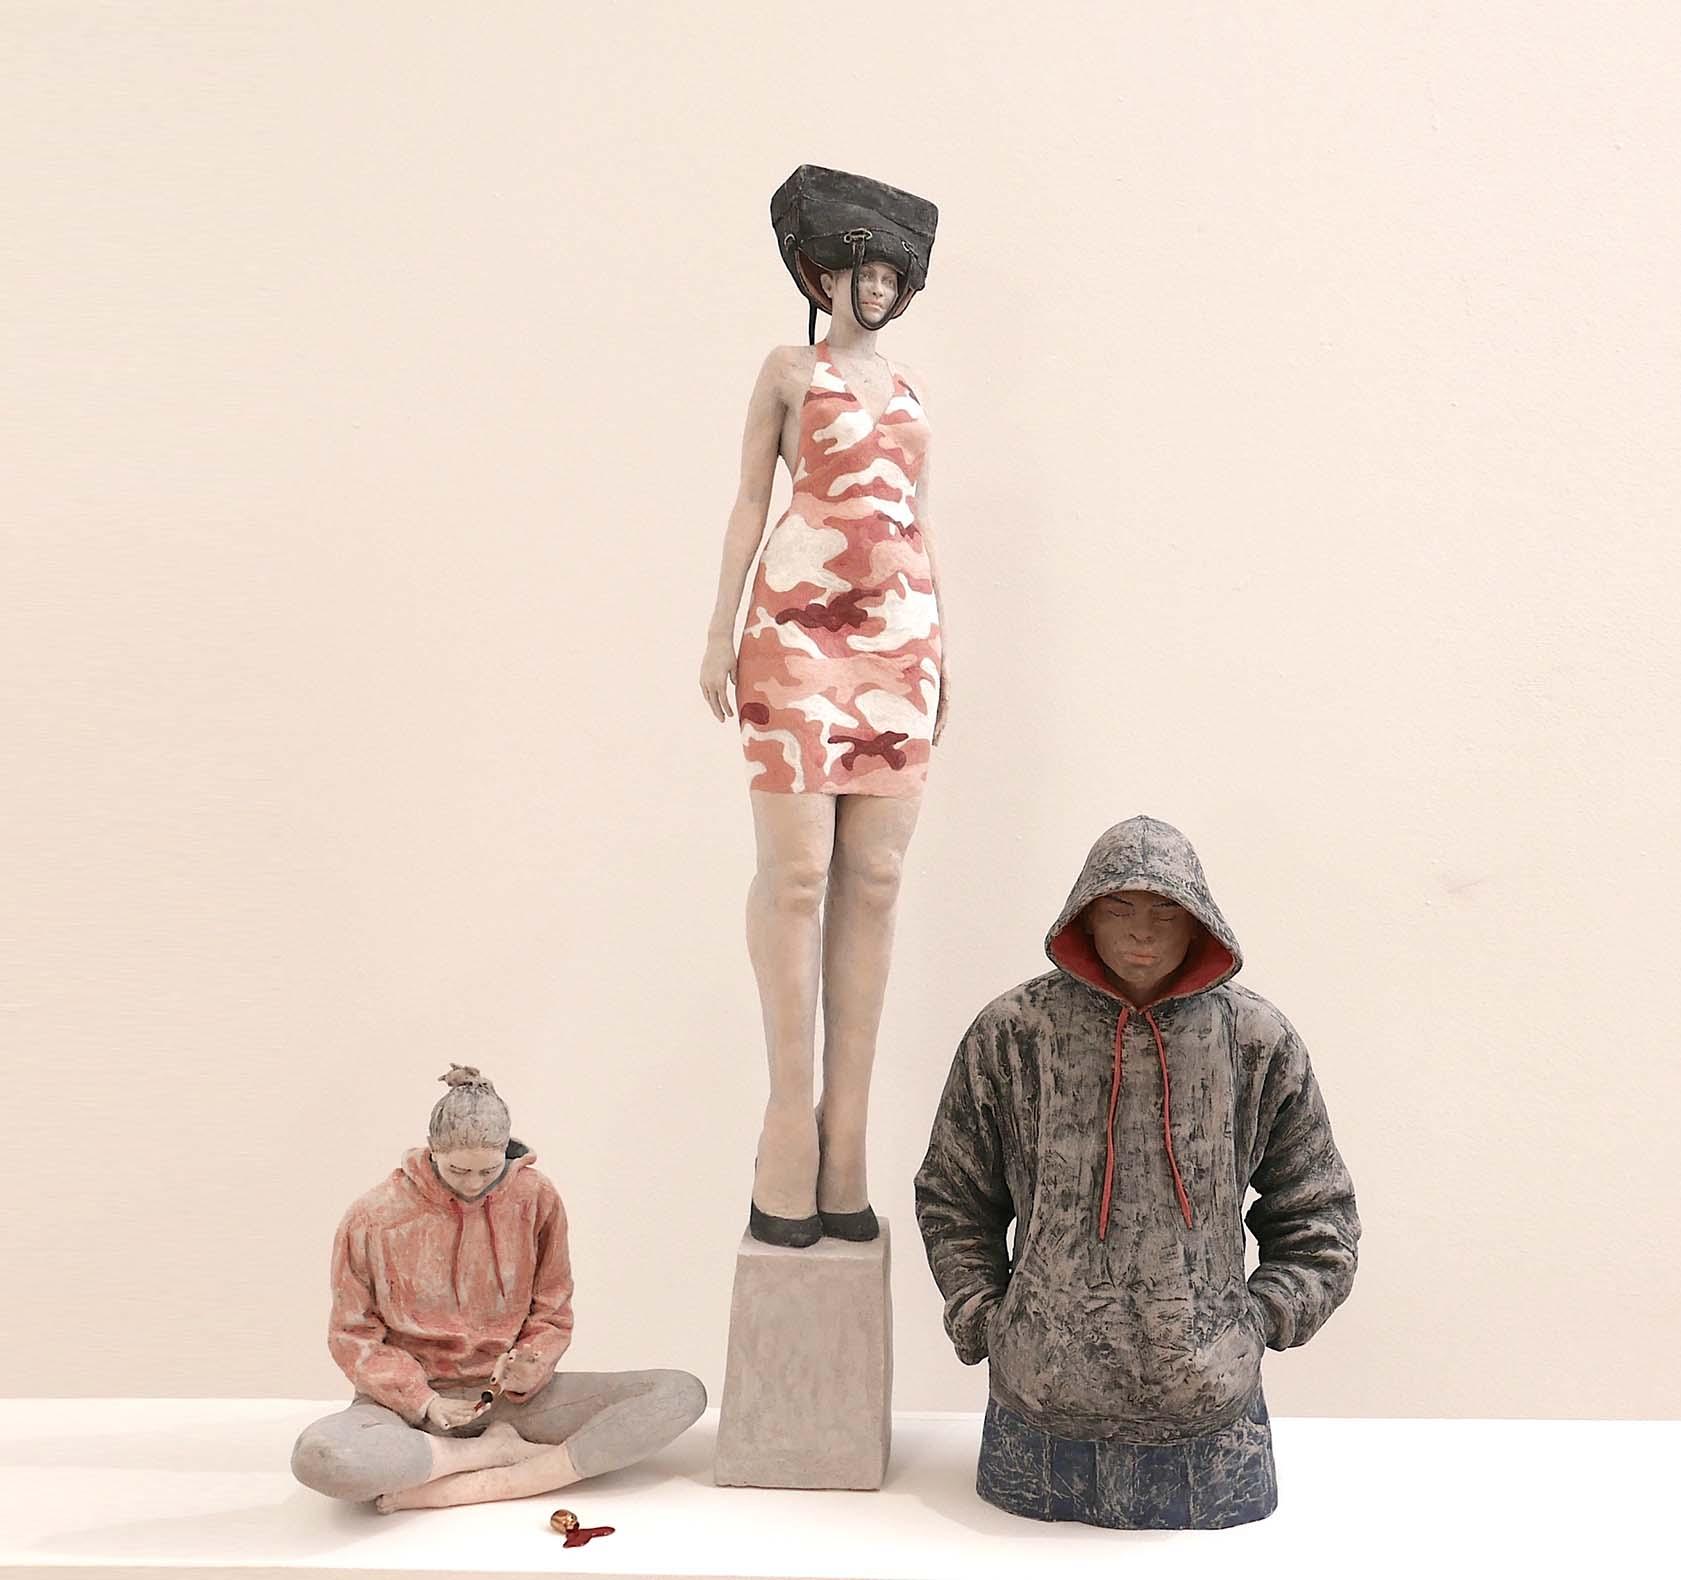 Südwestdeutscher Keramikpreis, Keramik, Stephanie Marie Roos